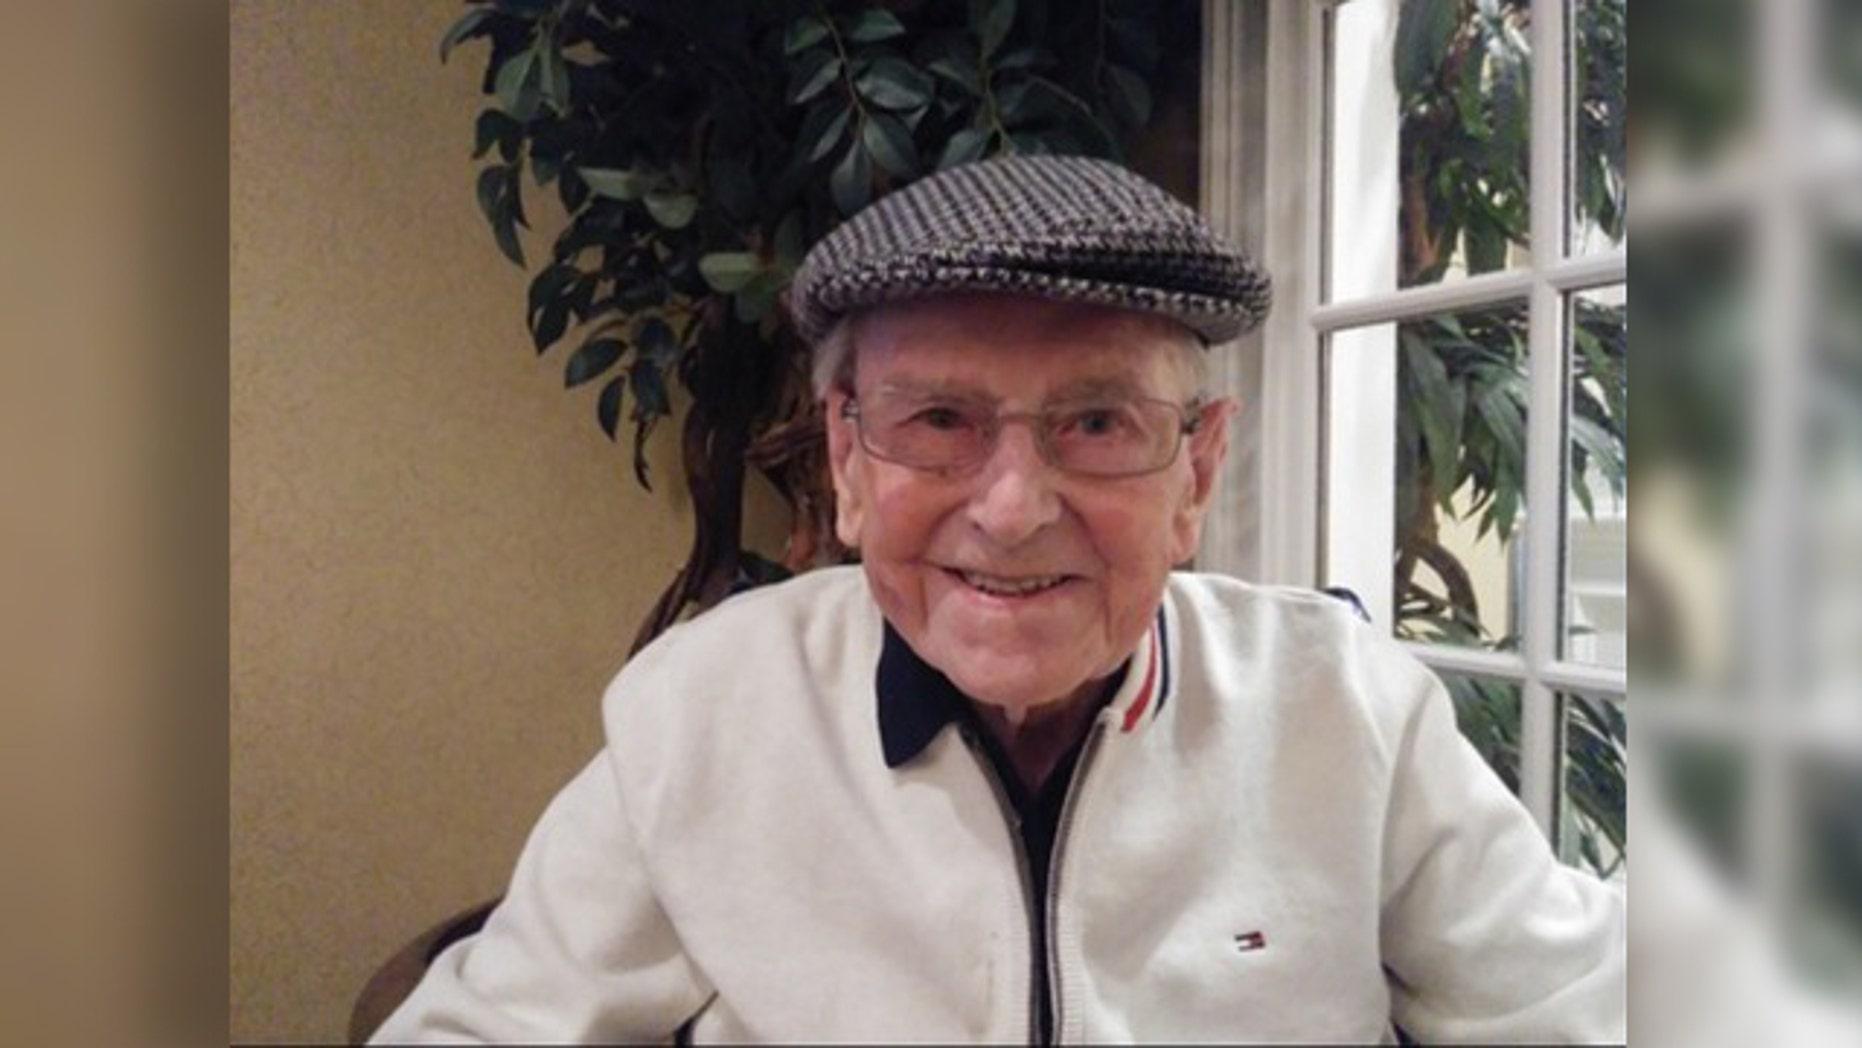 World War II Purple Heart recipient Edward Murphy marked his 100th birthday Saturday in Georgia.